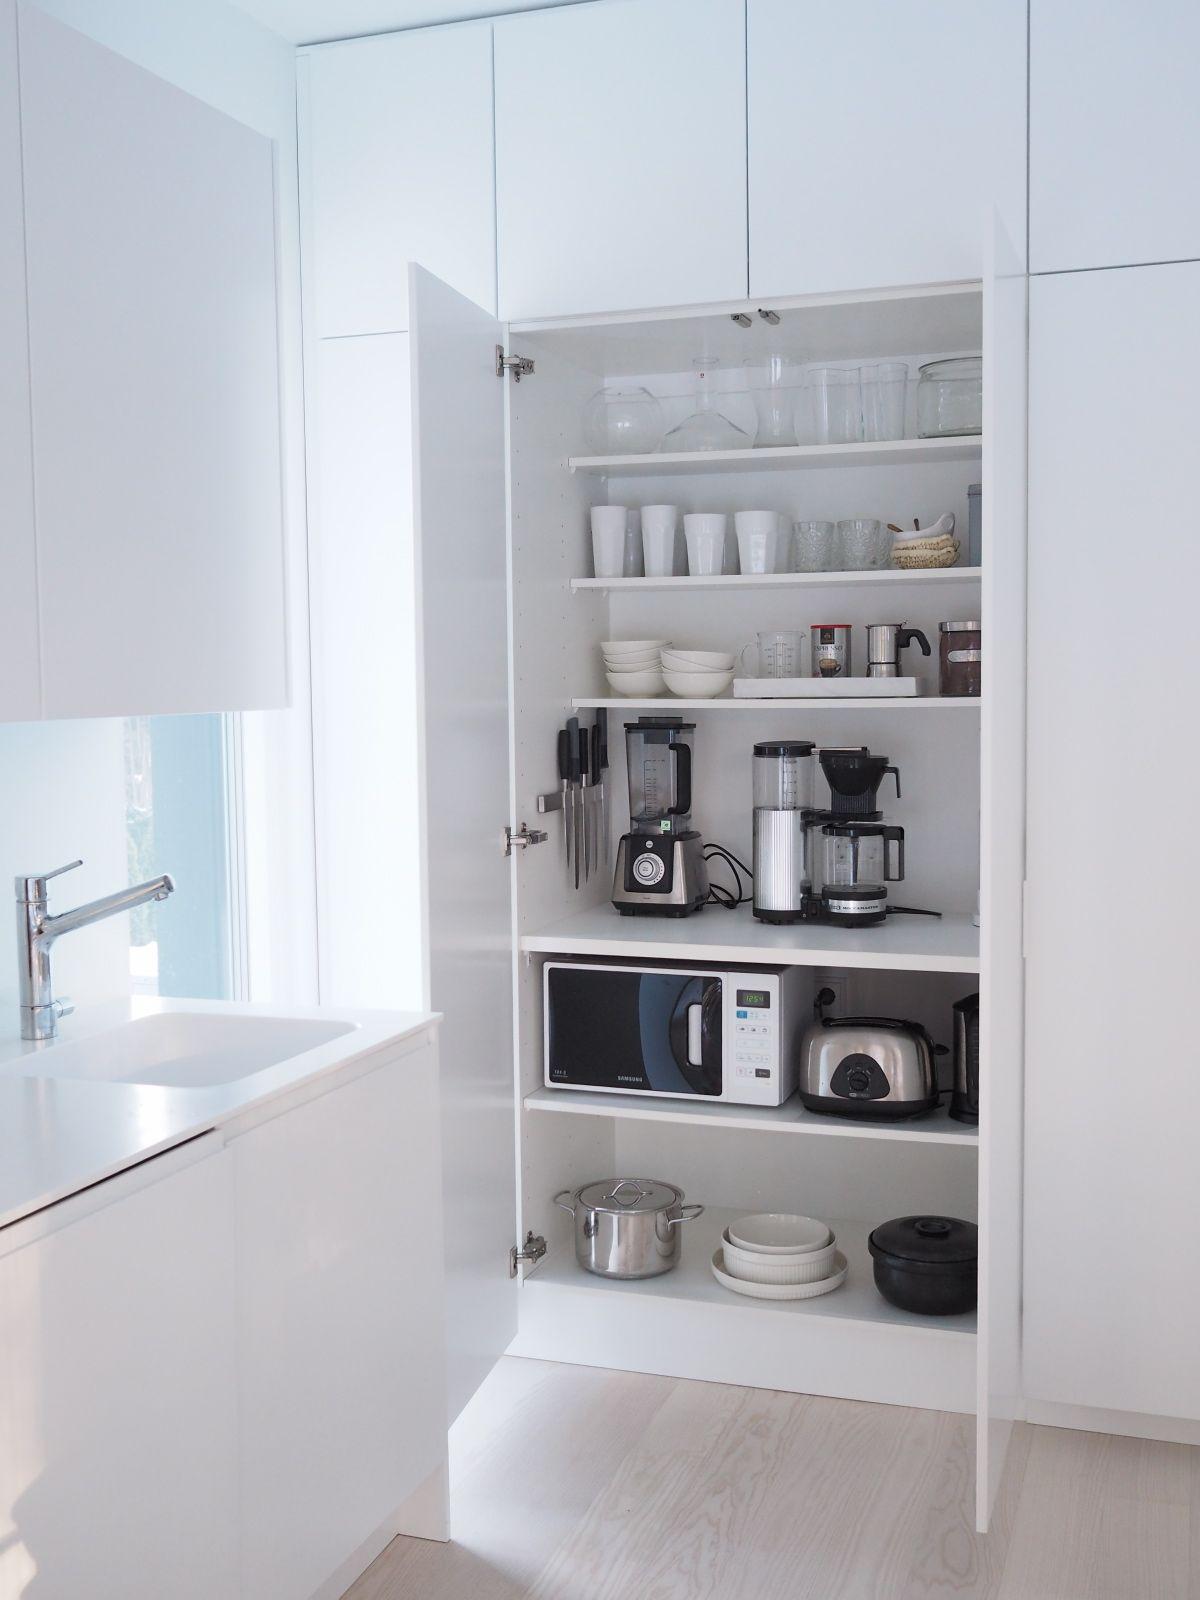 Unique Floor to Ceiling Storage Cabinets